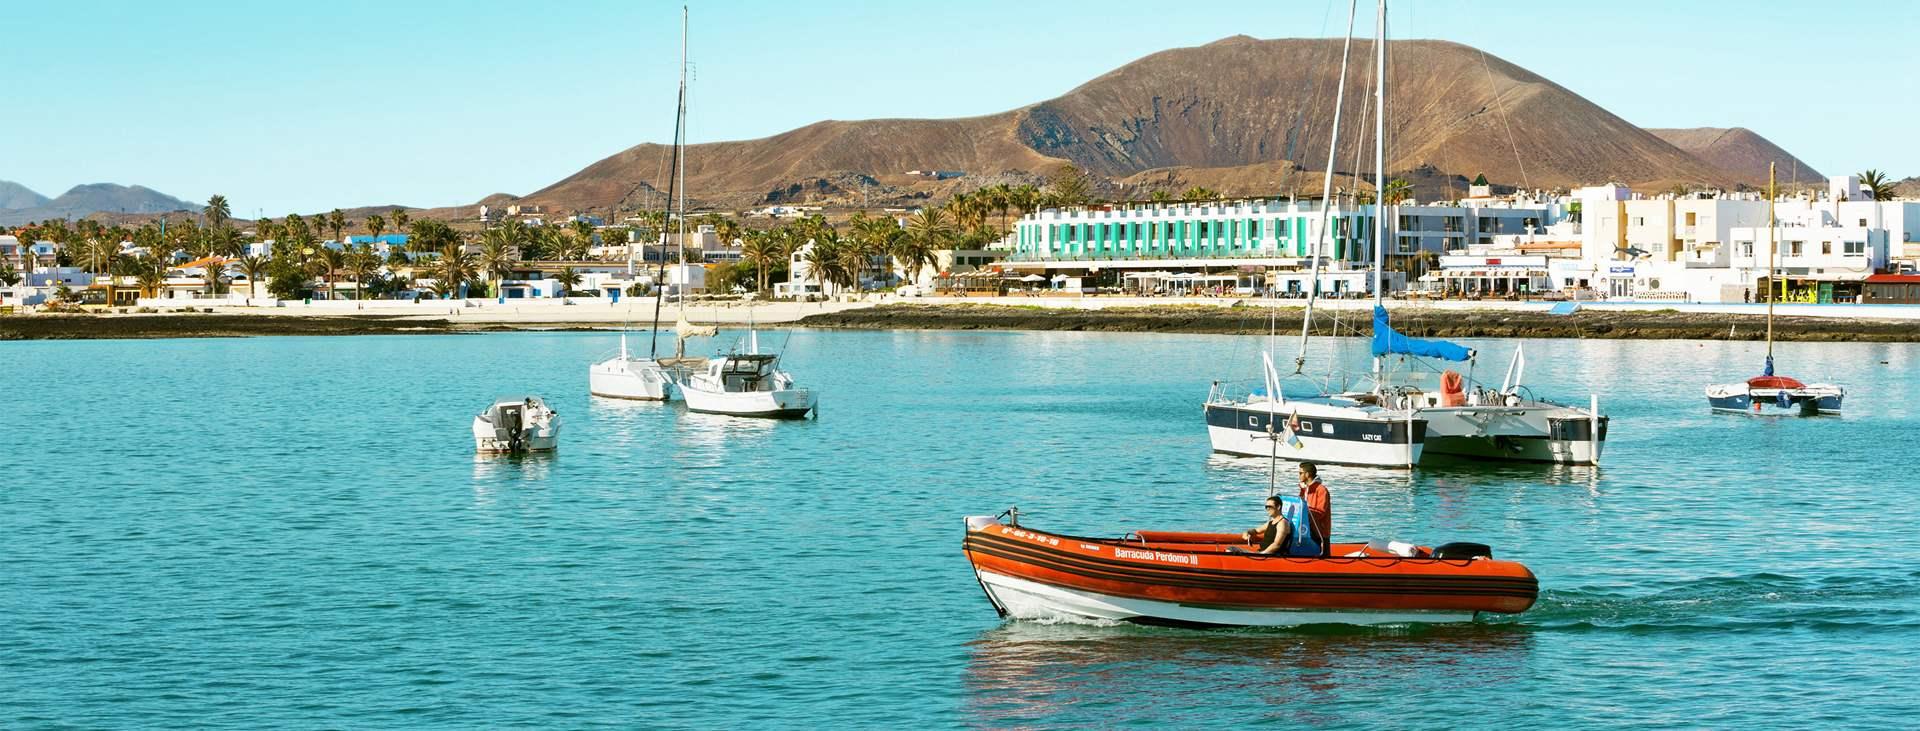 Bestill en reise med All Inclusive til Corralejo på Fuerteventura